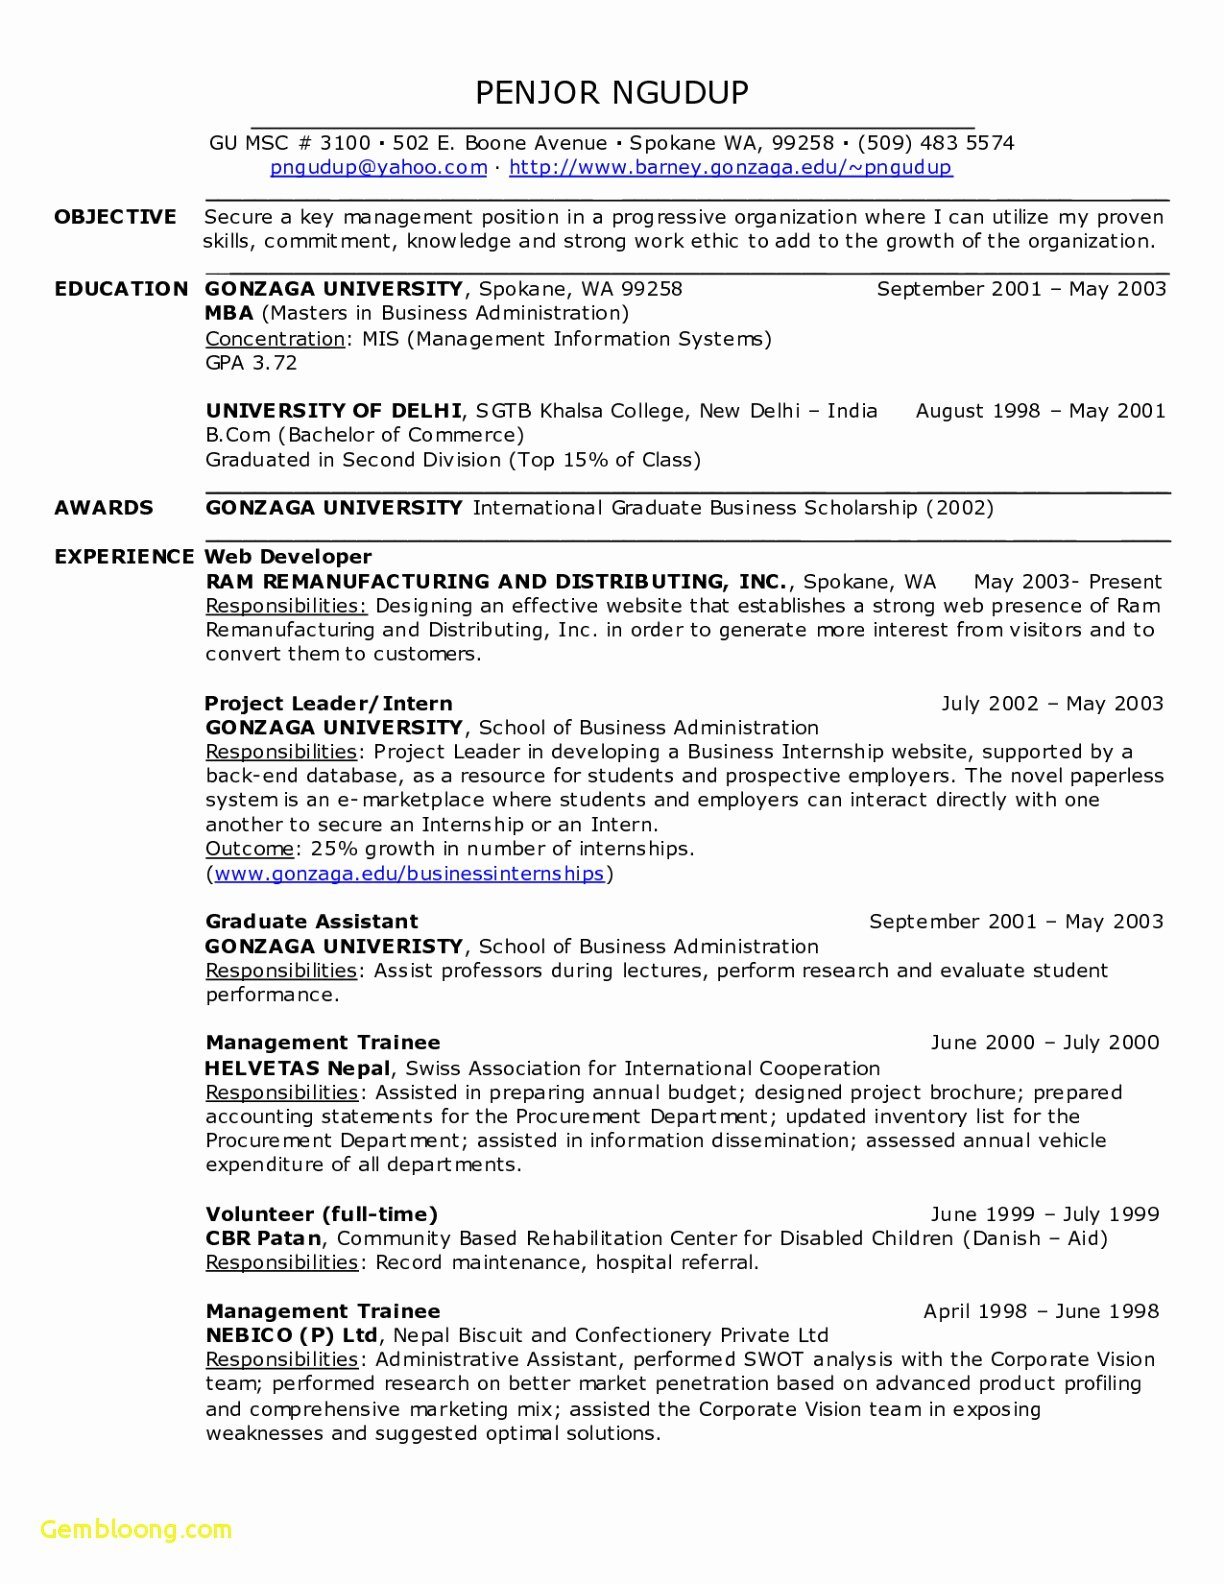 Executive Hybrid Resume Template New Executive Hybrid Resume Template – Hybrid Resume Template